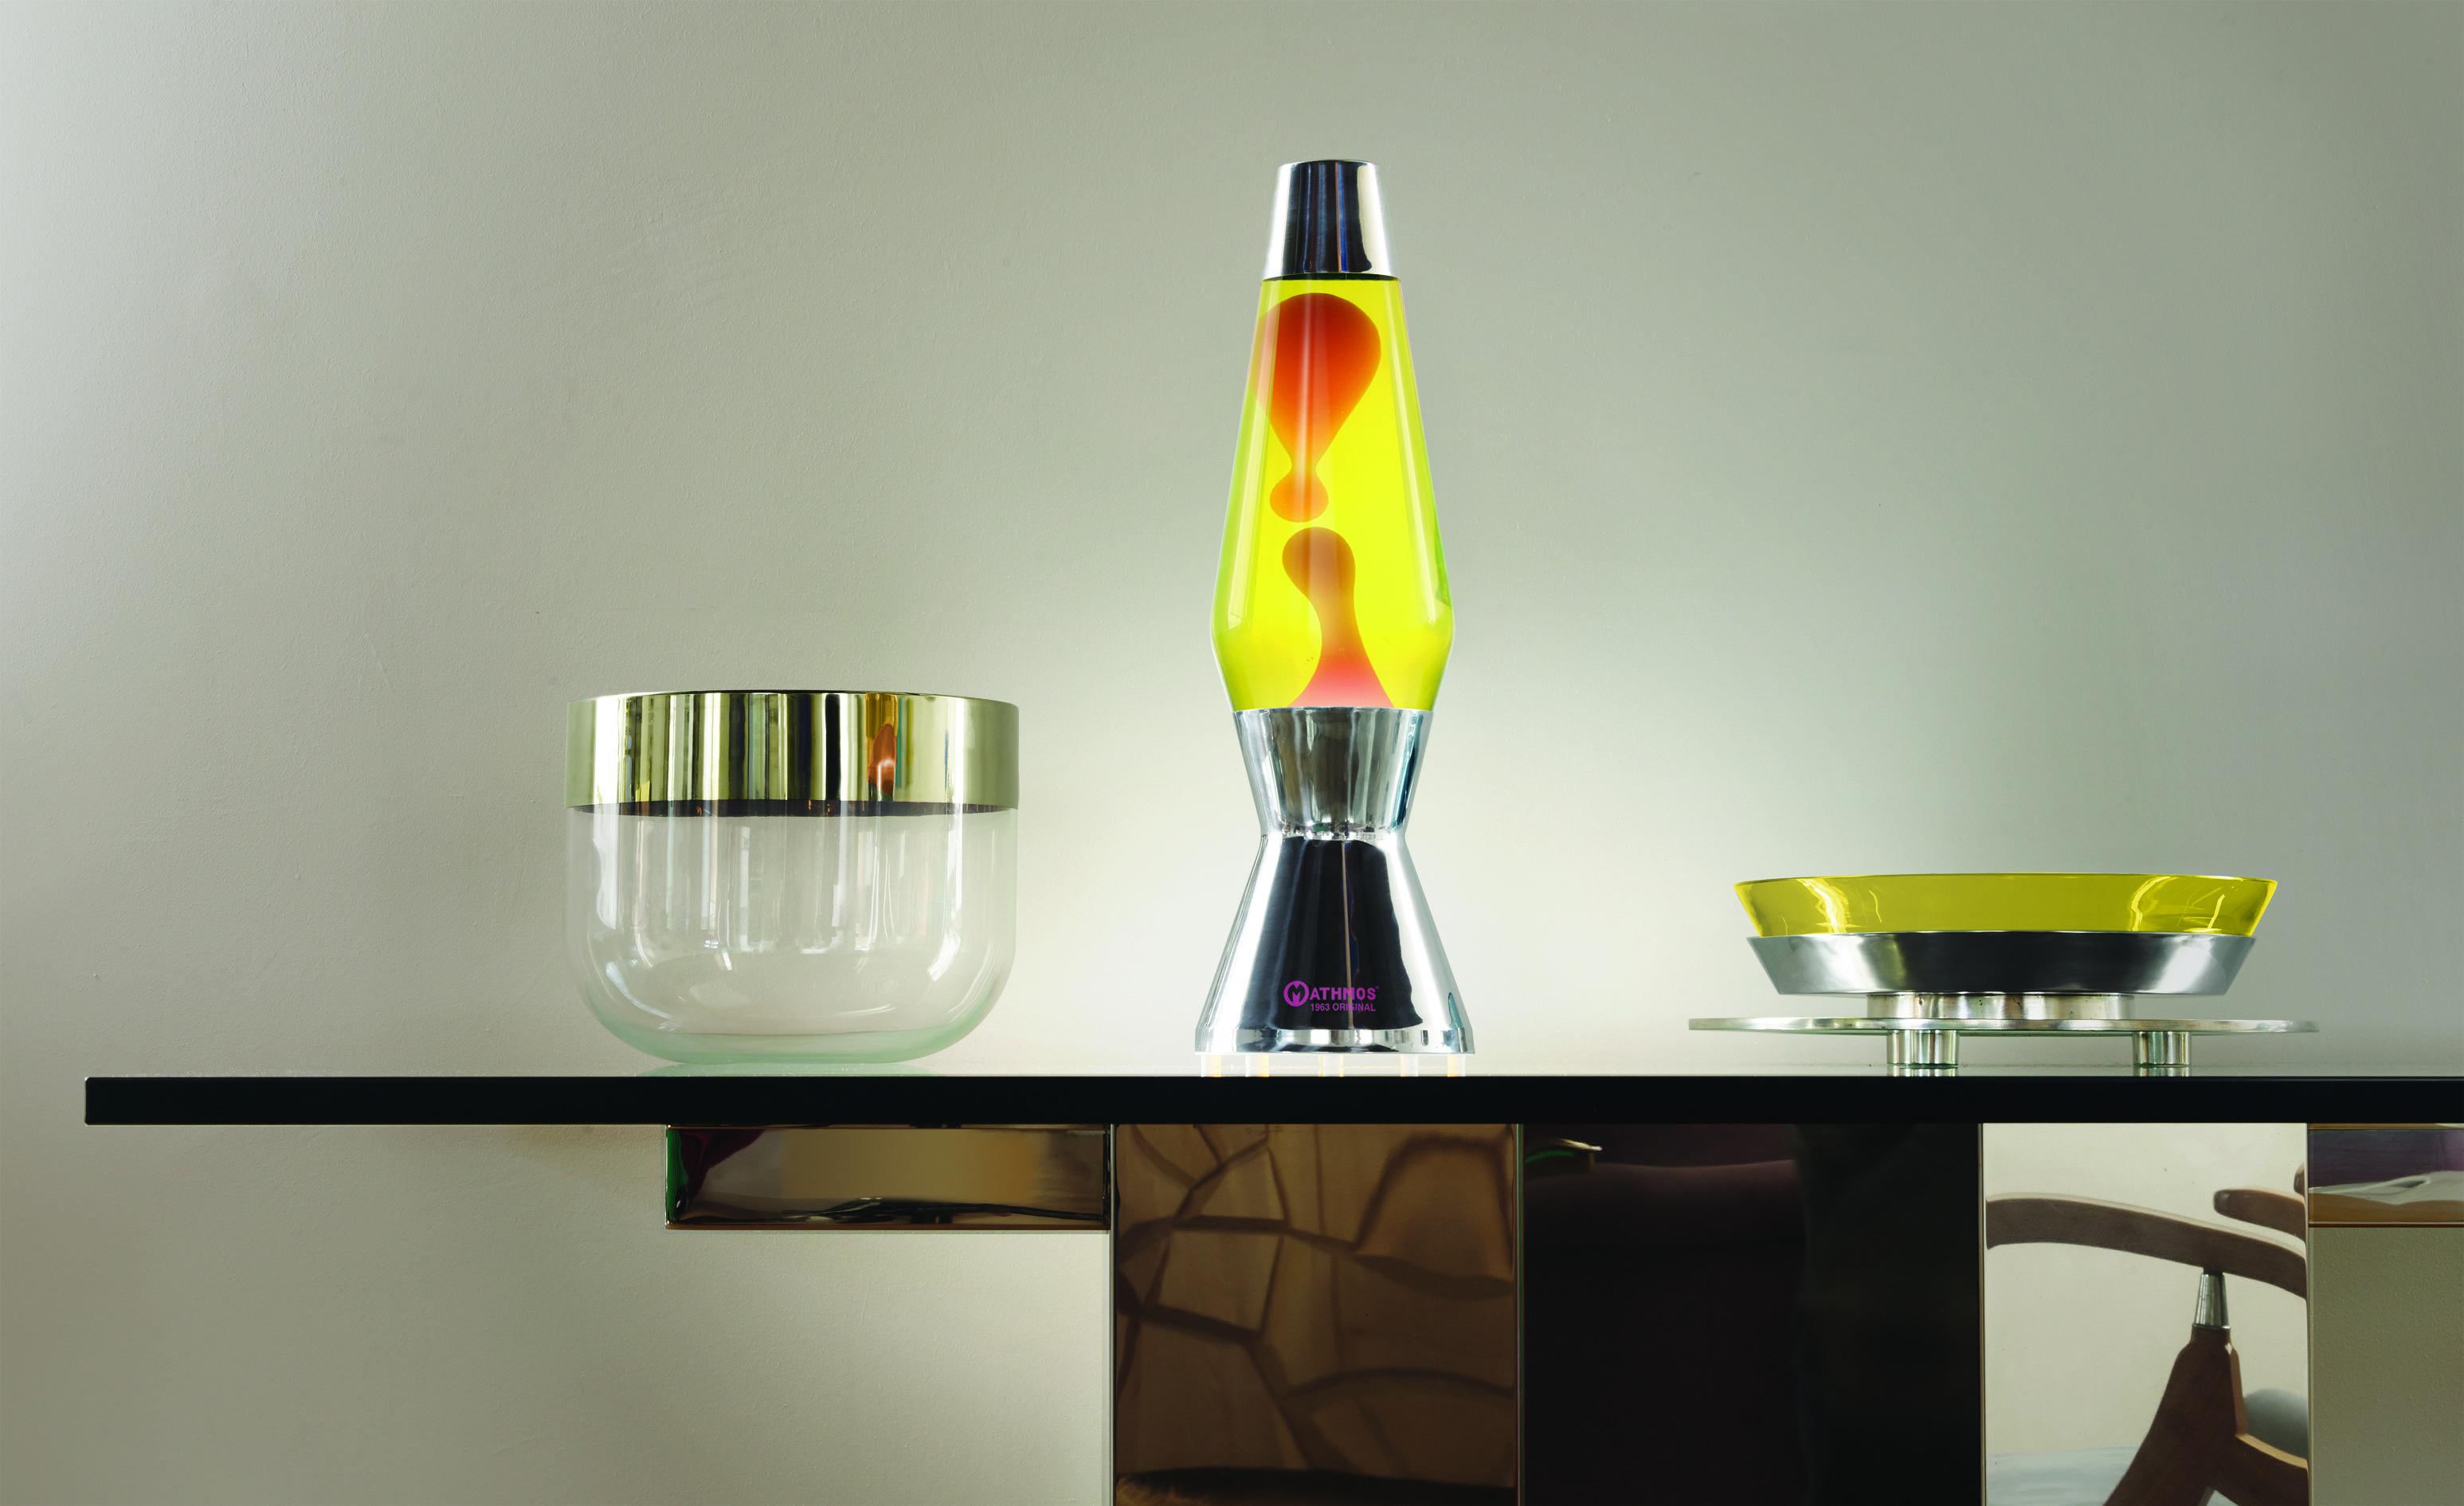 Mathmos Astro Lava Lamp The First And Original Lava Lamp